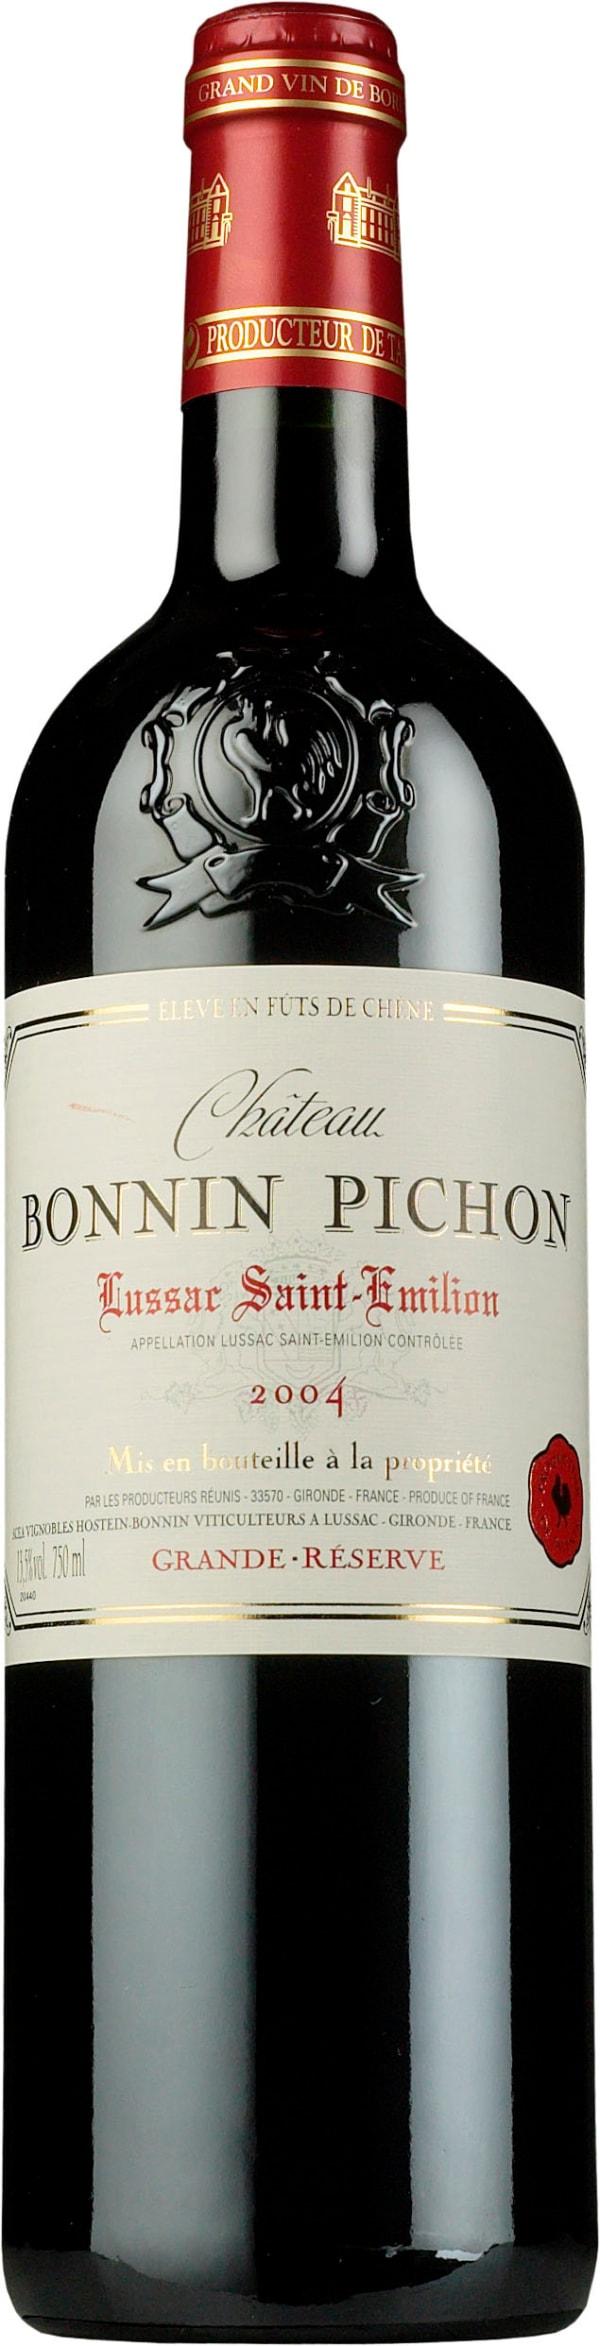 Château Bonnin Pichon 2018